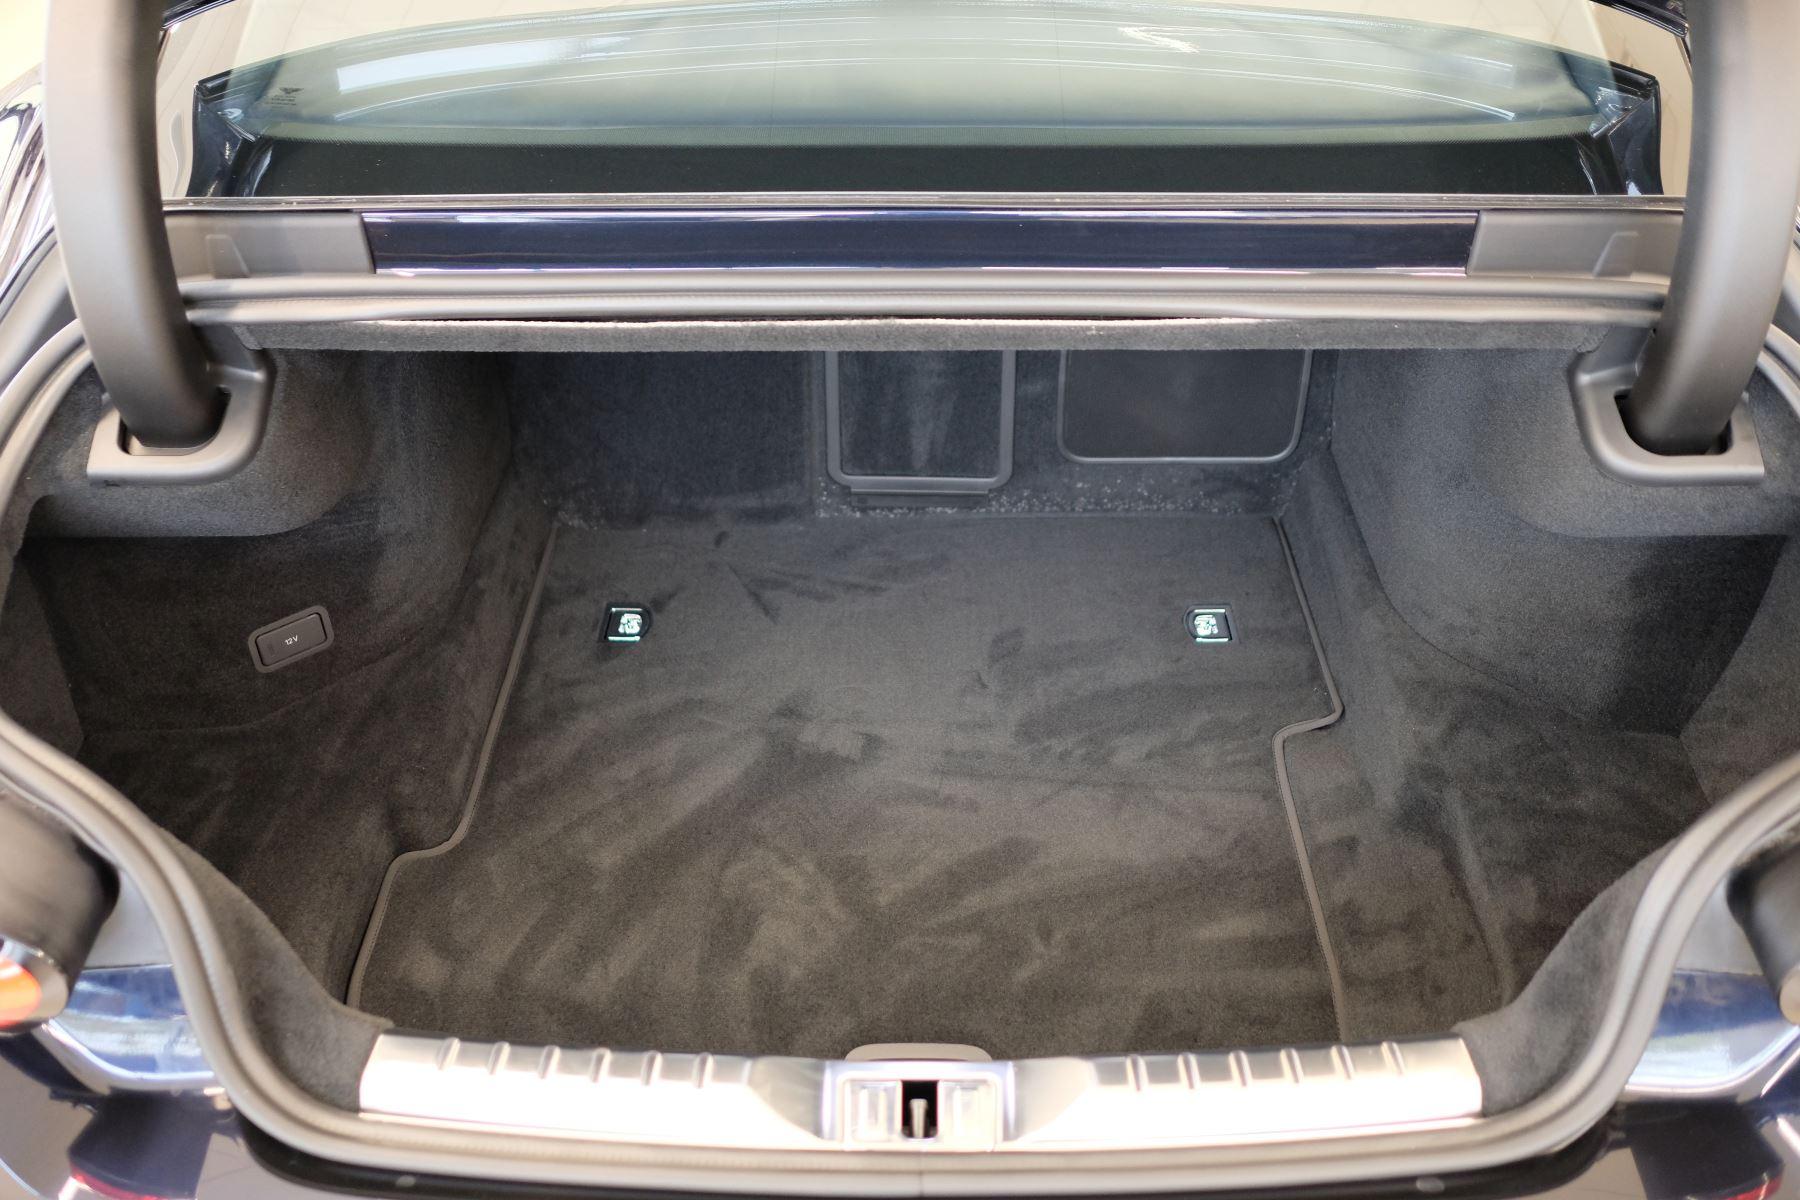 Bentley Continental GT 4.0 V8 Mulliner Edition Auto [Tour Spec] image 9